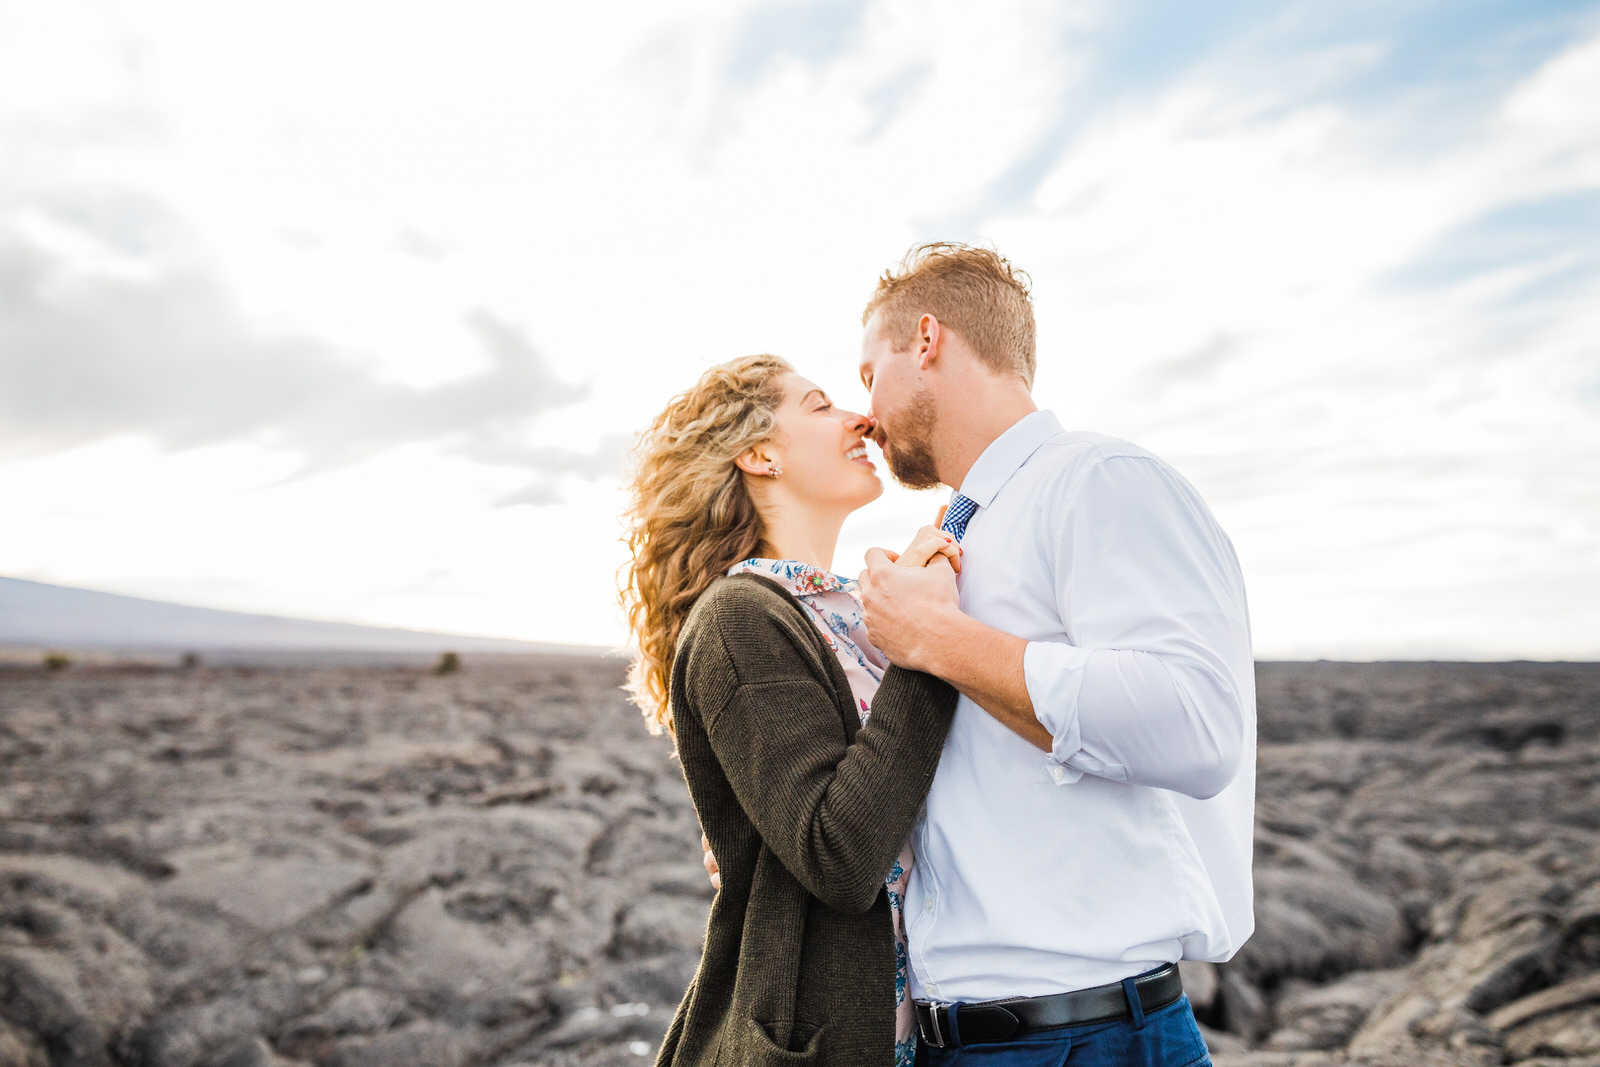 engagements-hilo-happy-couple-big-island-hawaii-8.jpg